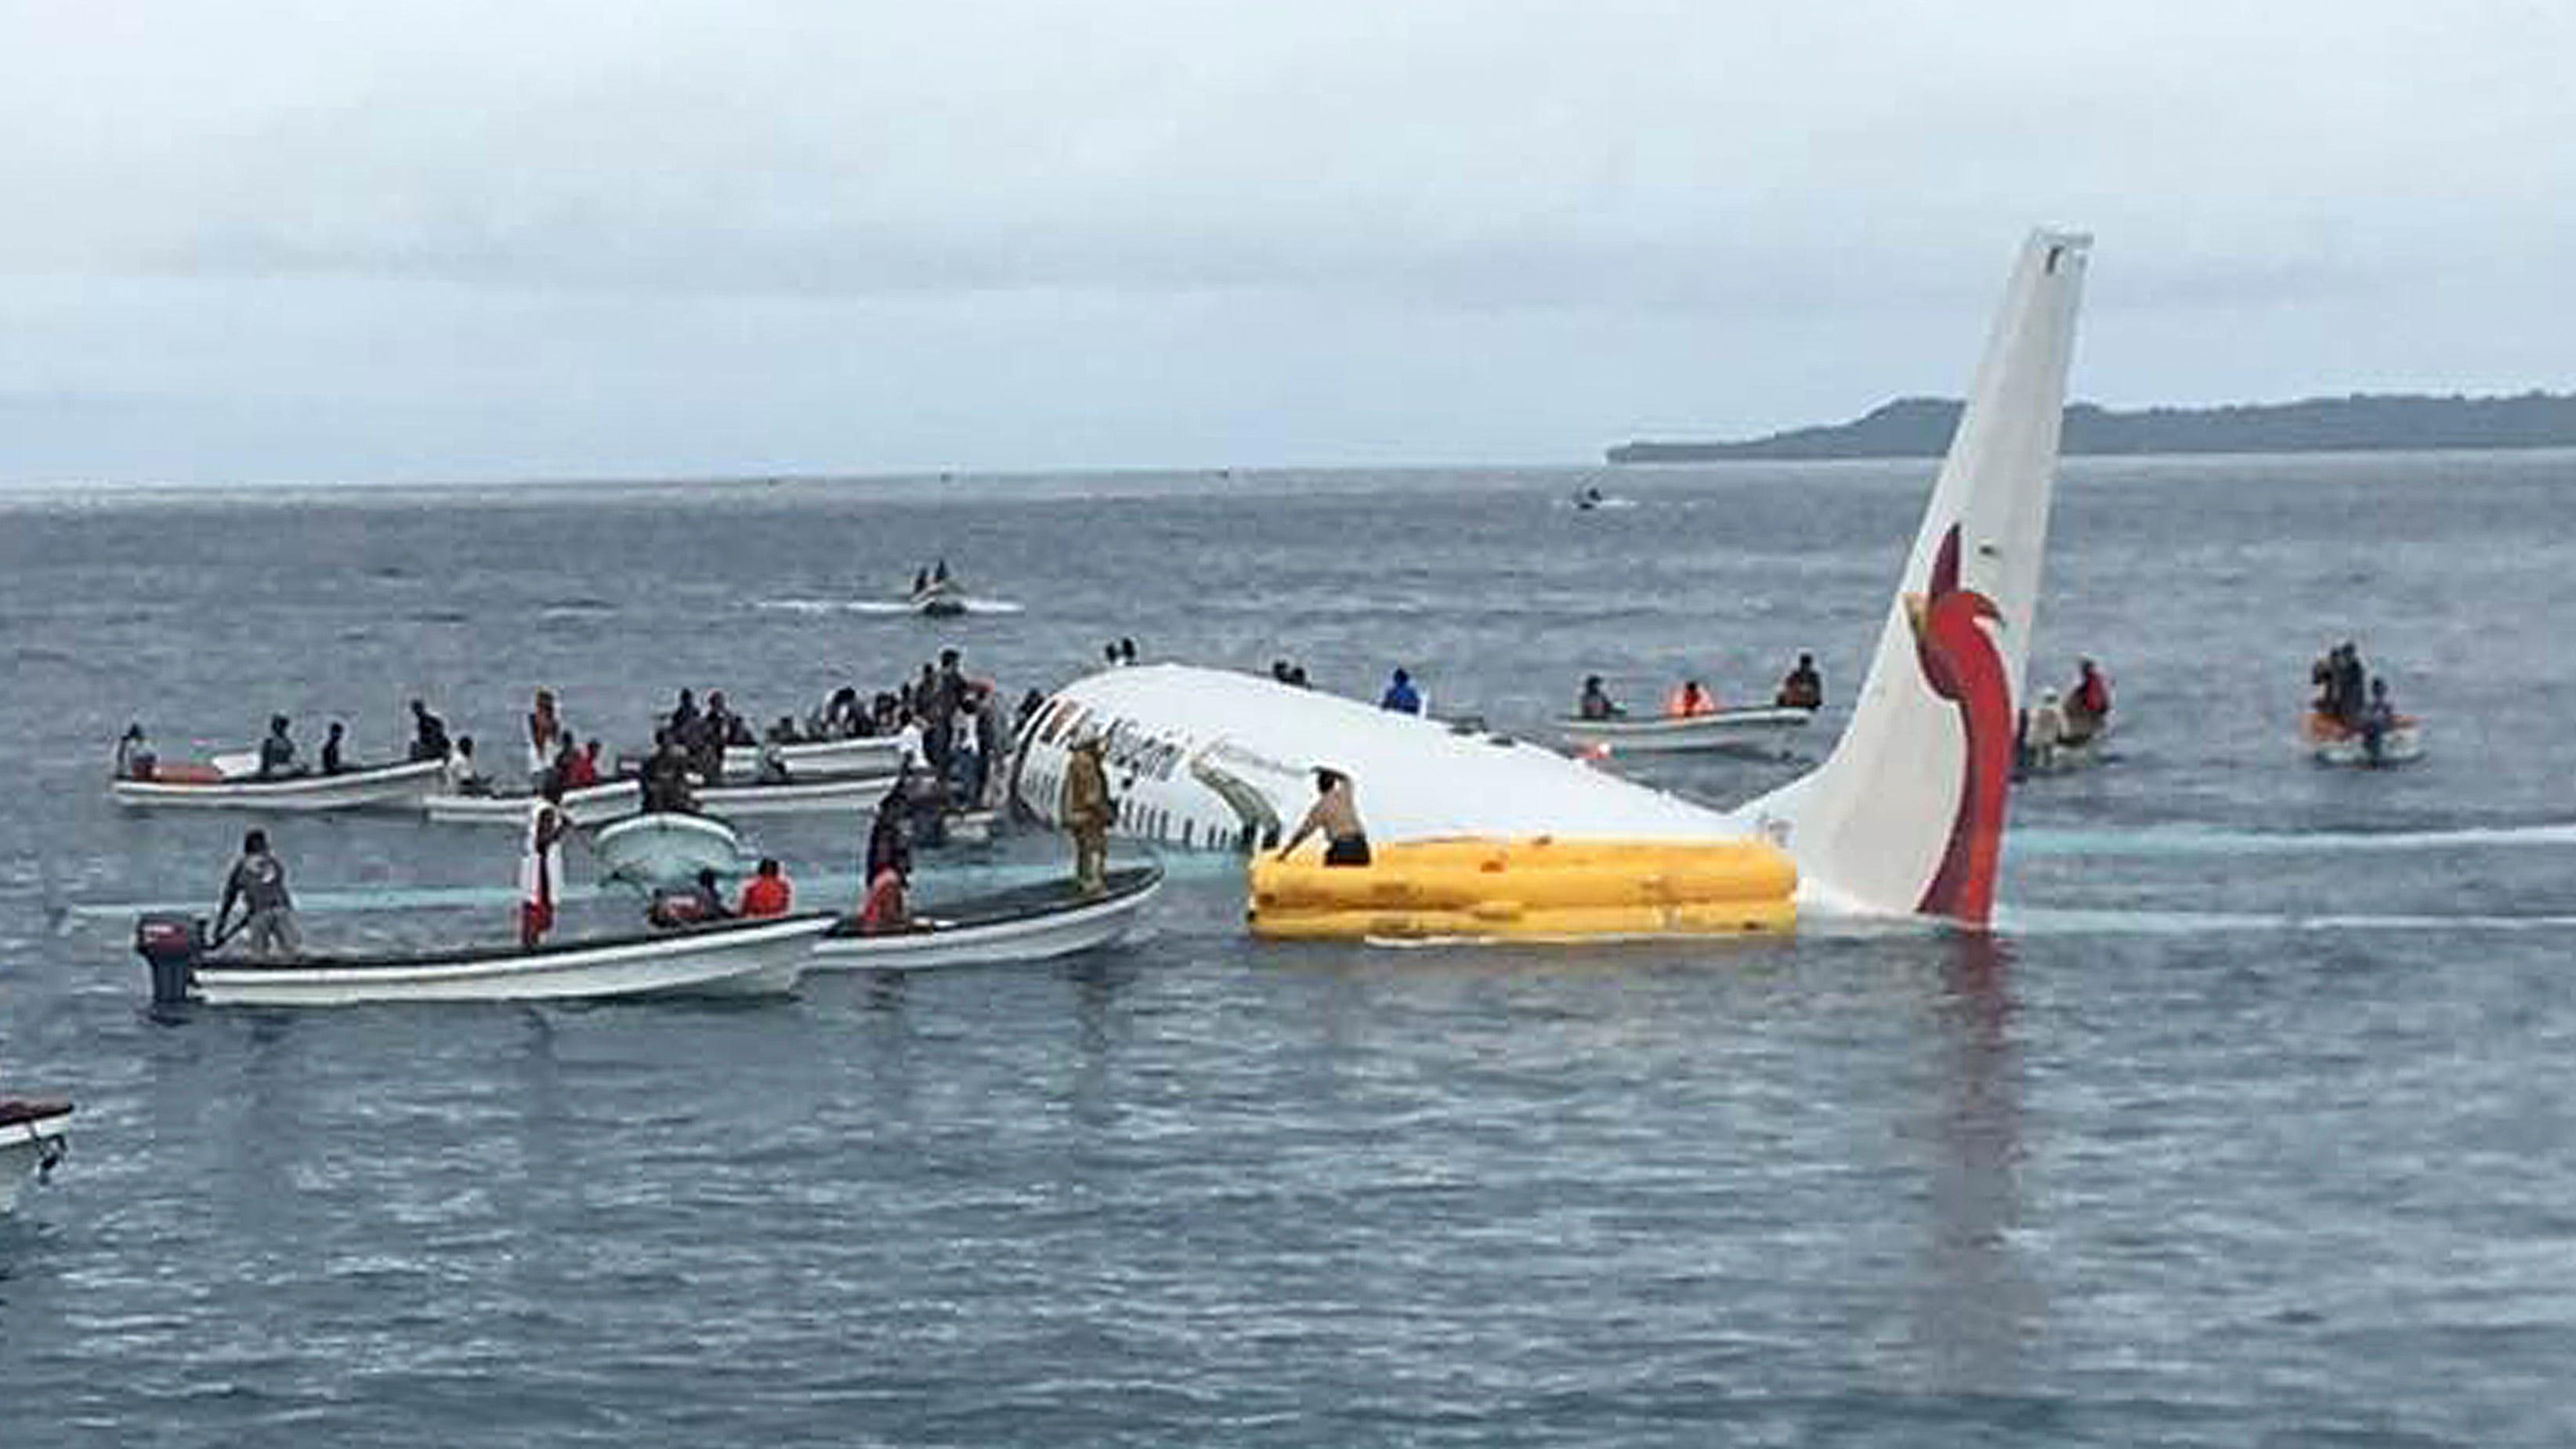 air niugini crash passengers and crew safe as plane lands